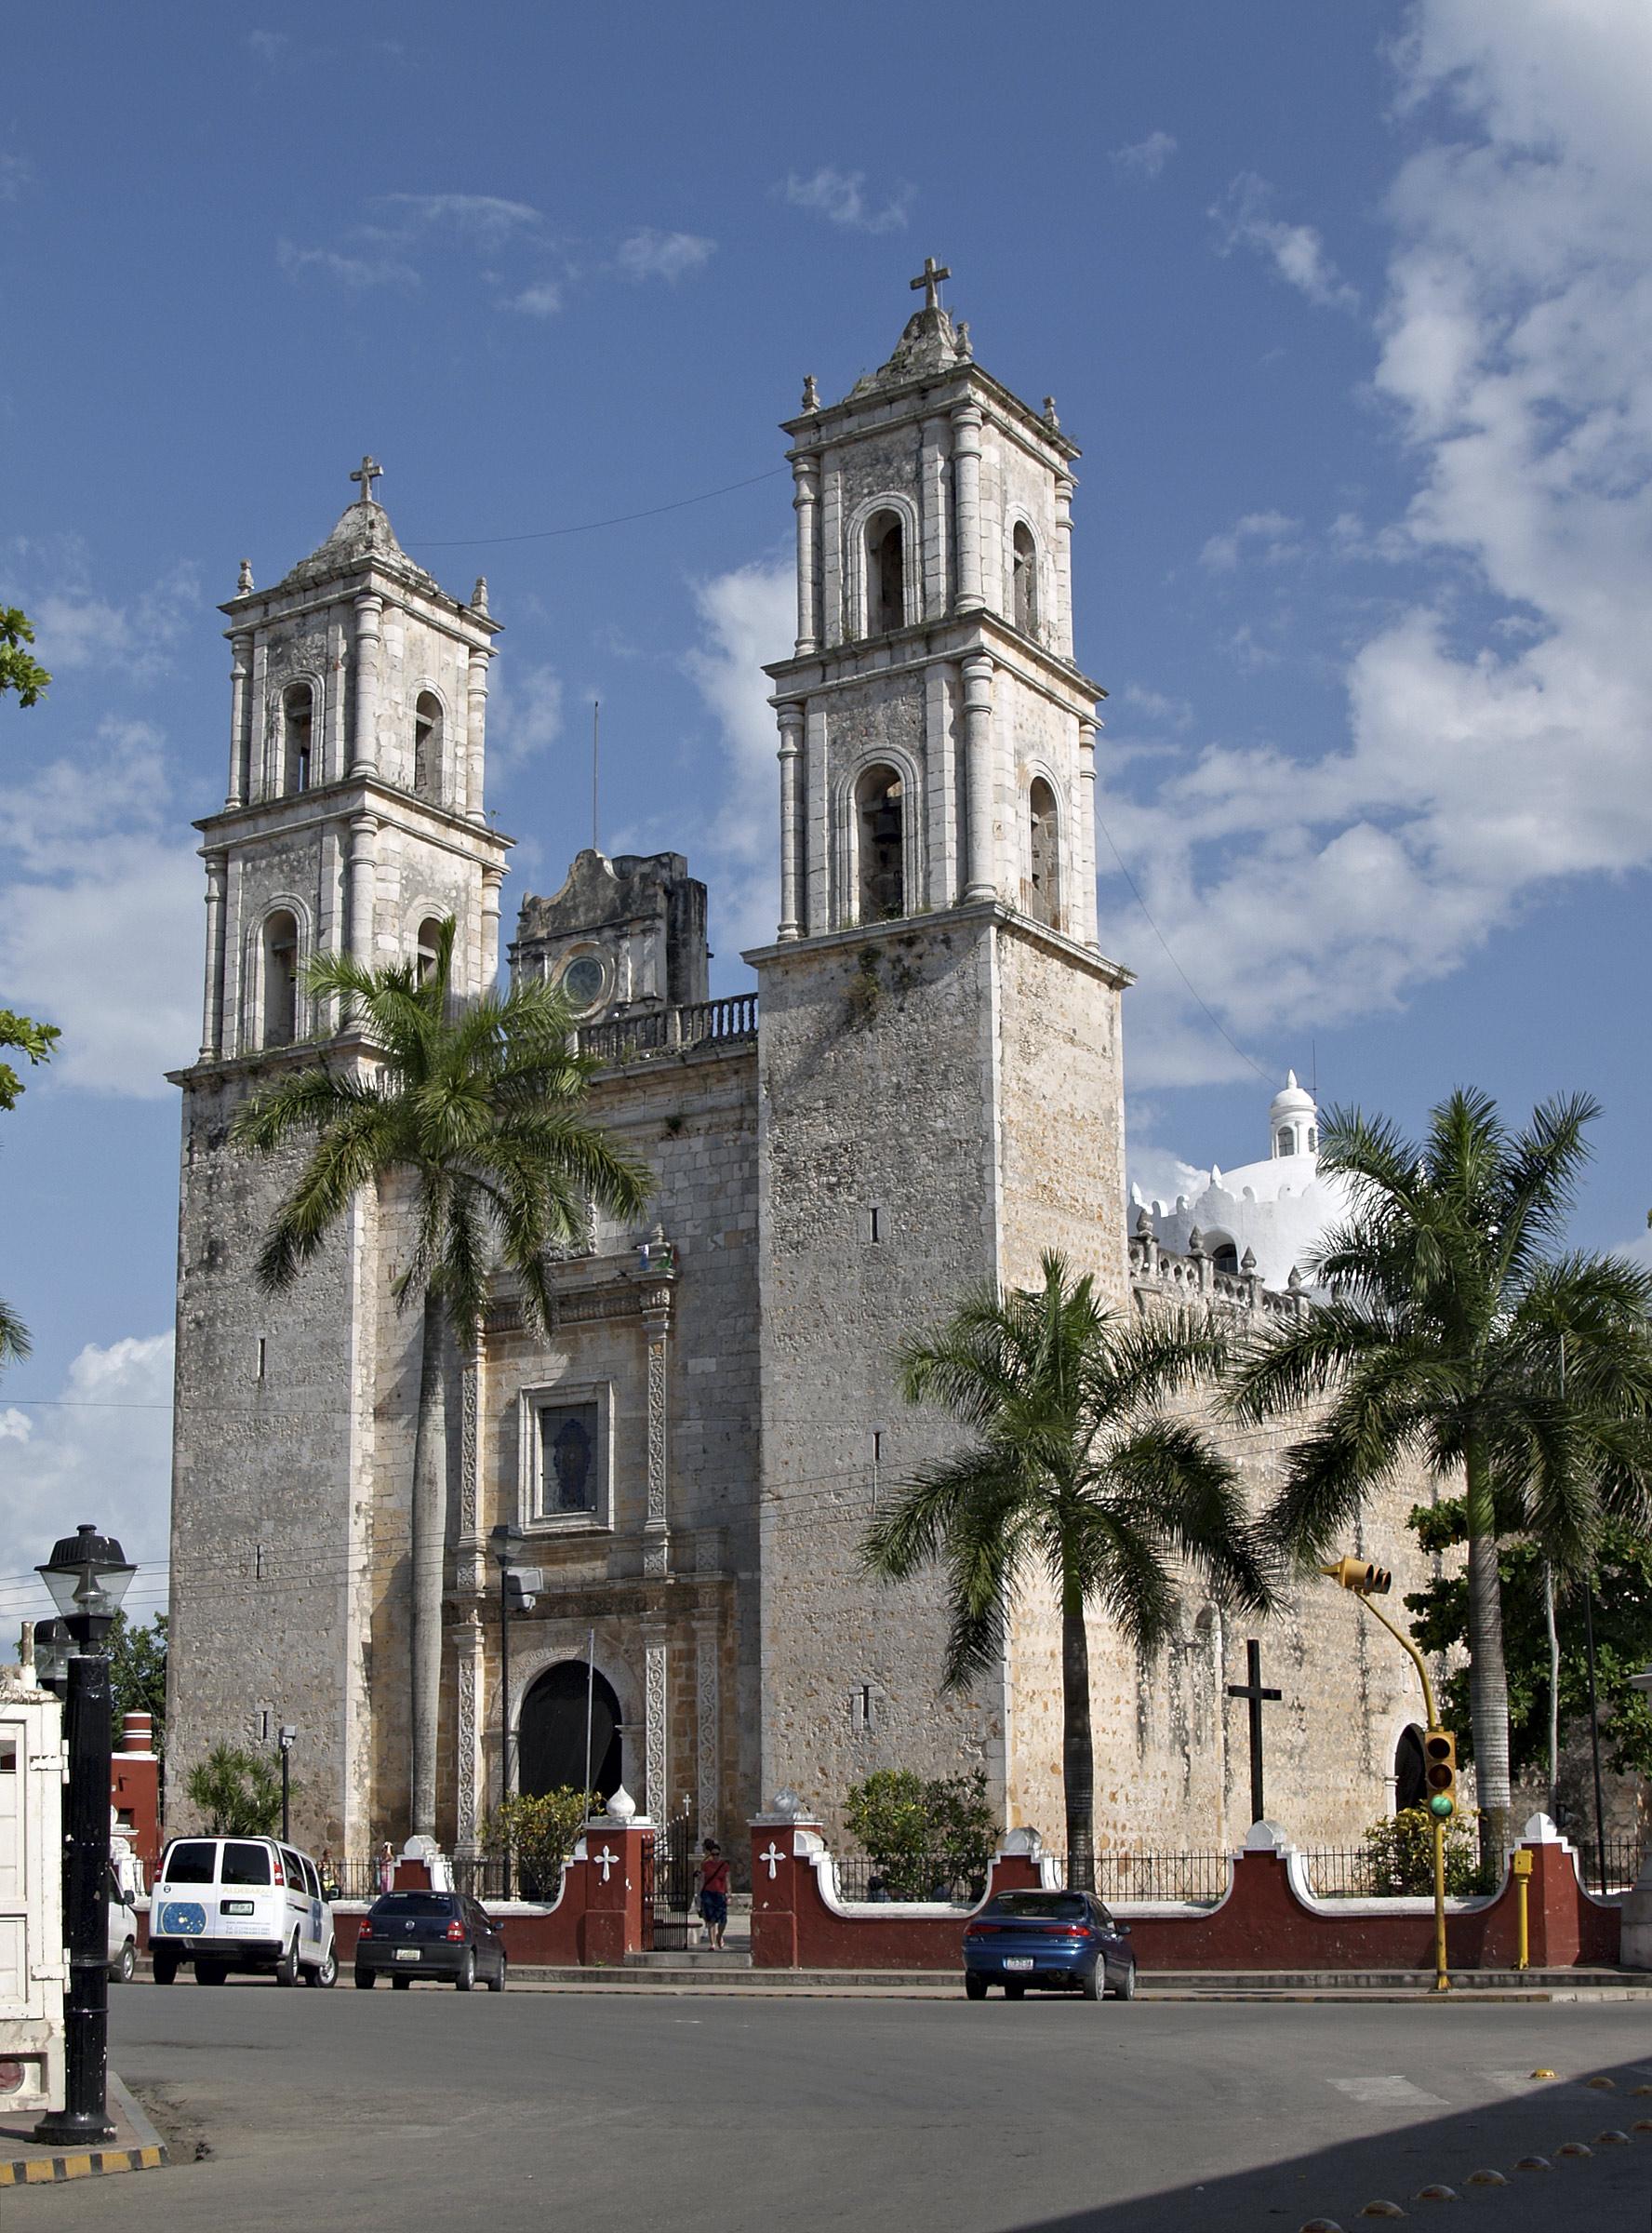 File:Valladolid-Yucatan-20070707.jpg - Wikimedia Commons